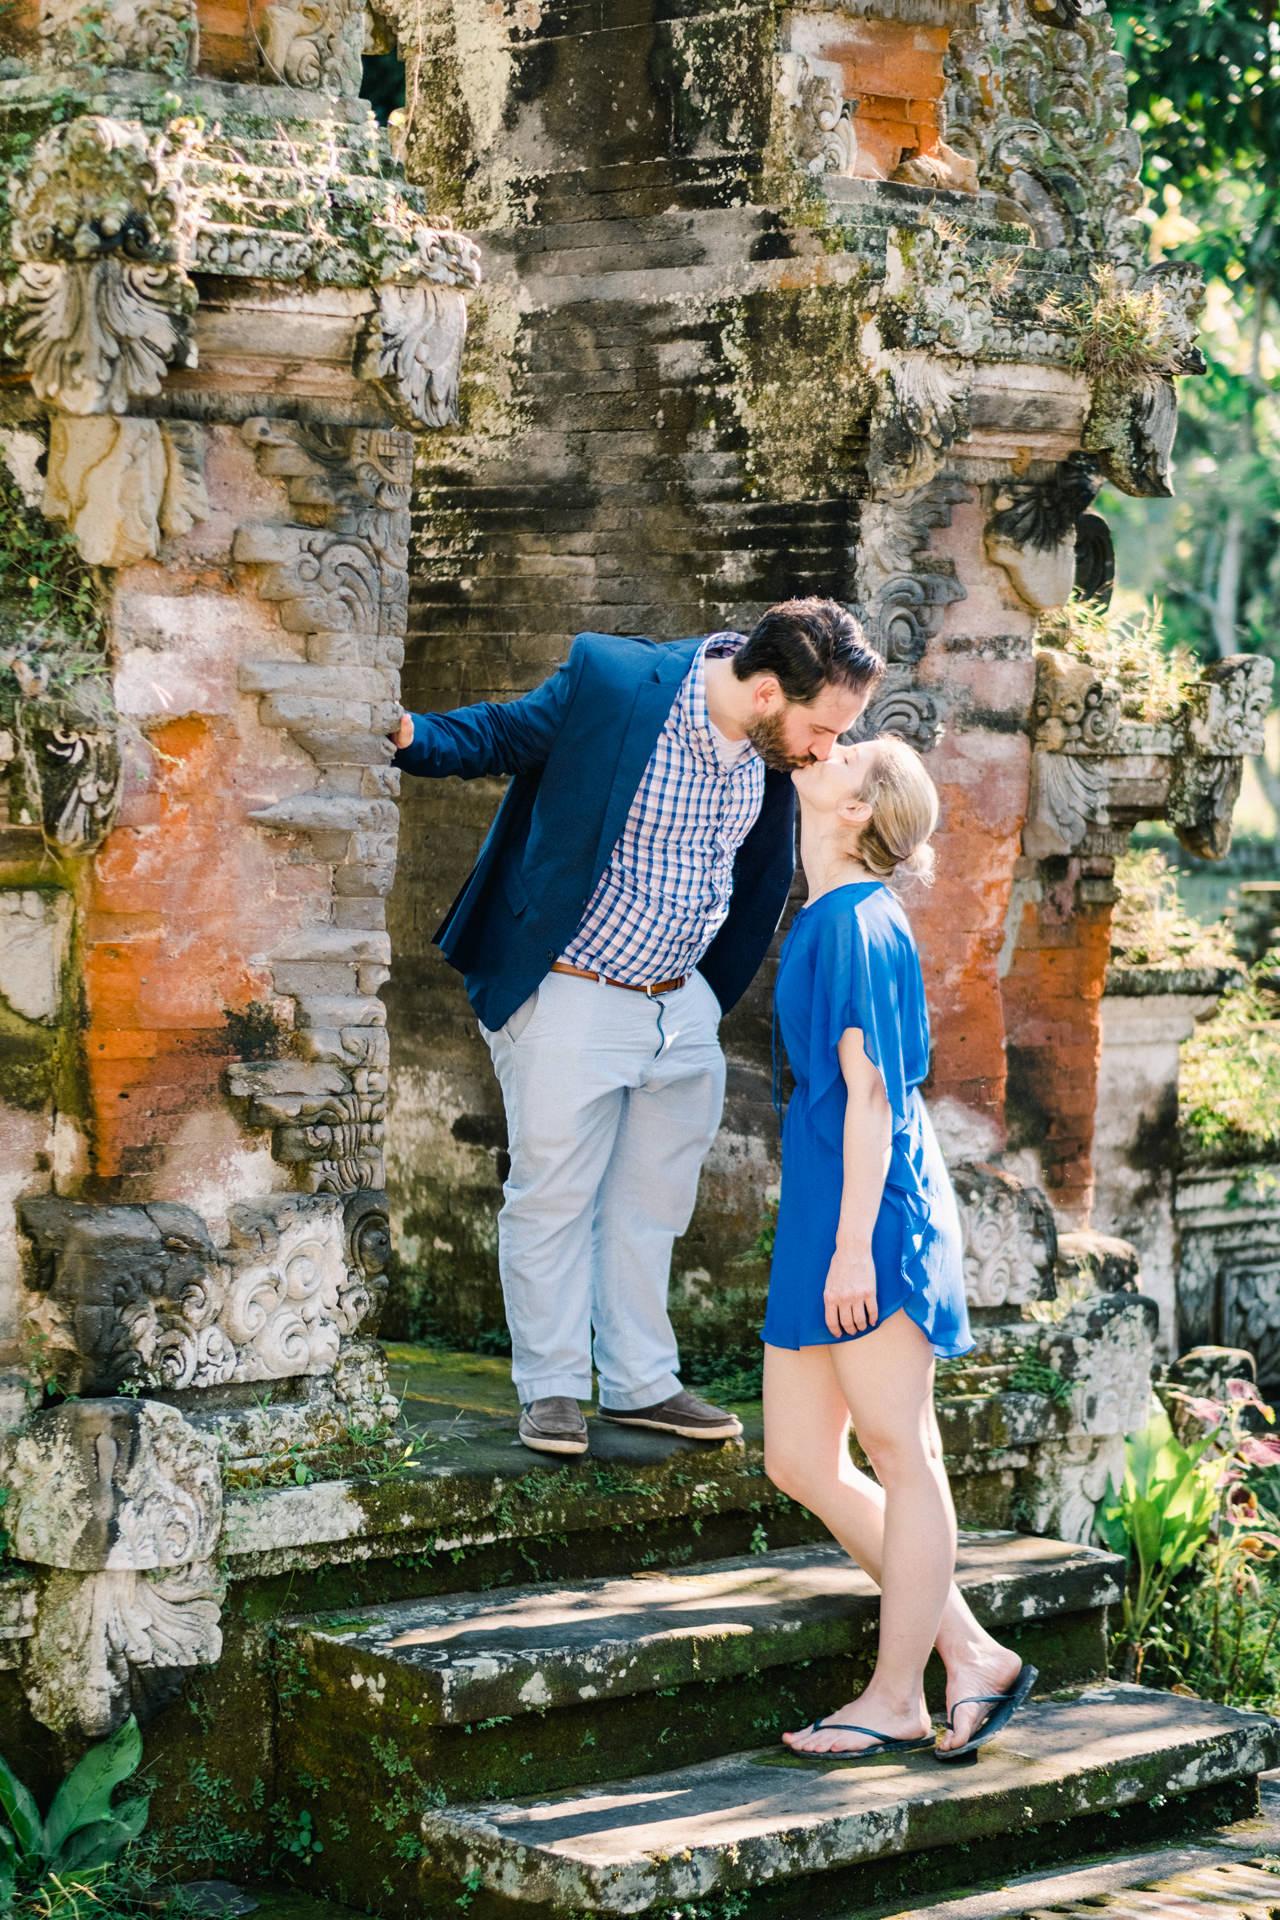 B&M: Surprise Proposal on Bali Vacation 11